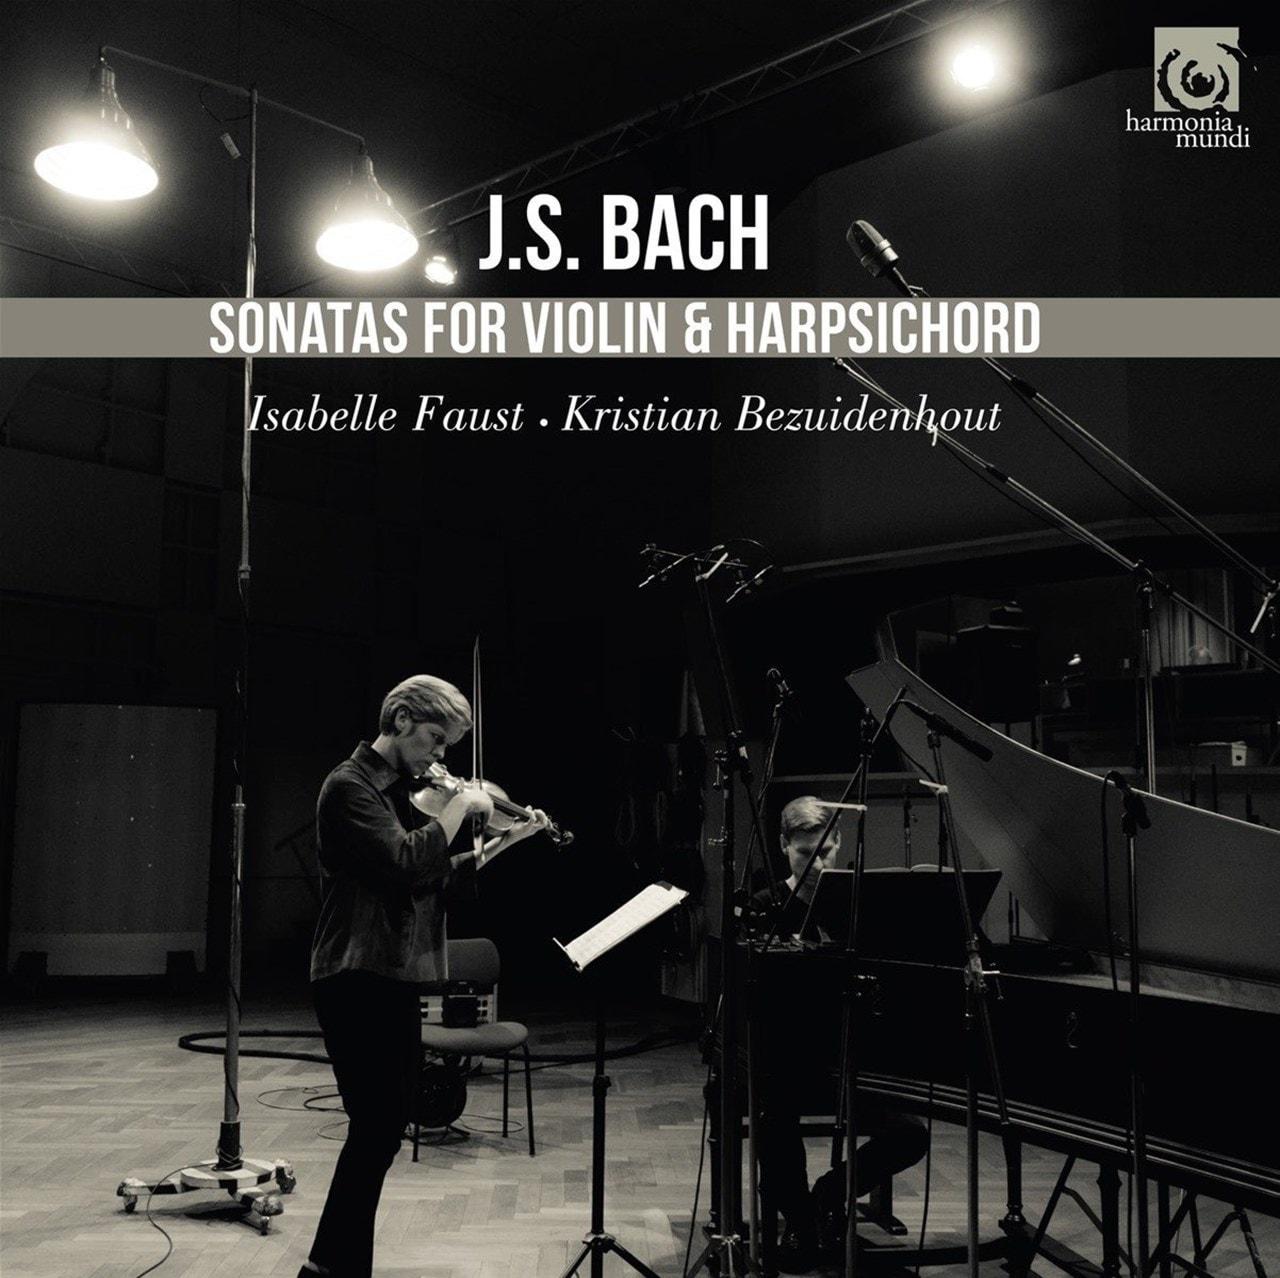 J.S. Bach: Sonatas for Violin & Harpsichord - 1